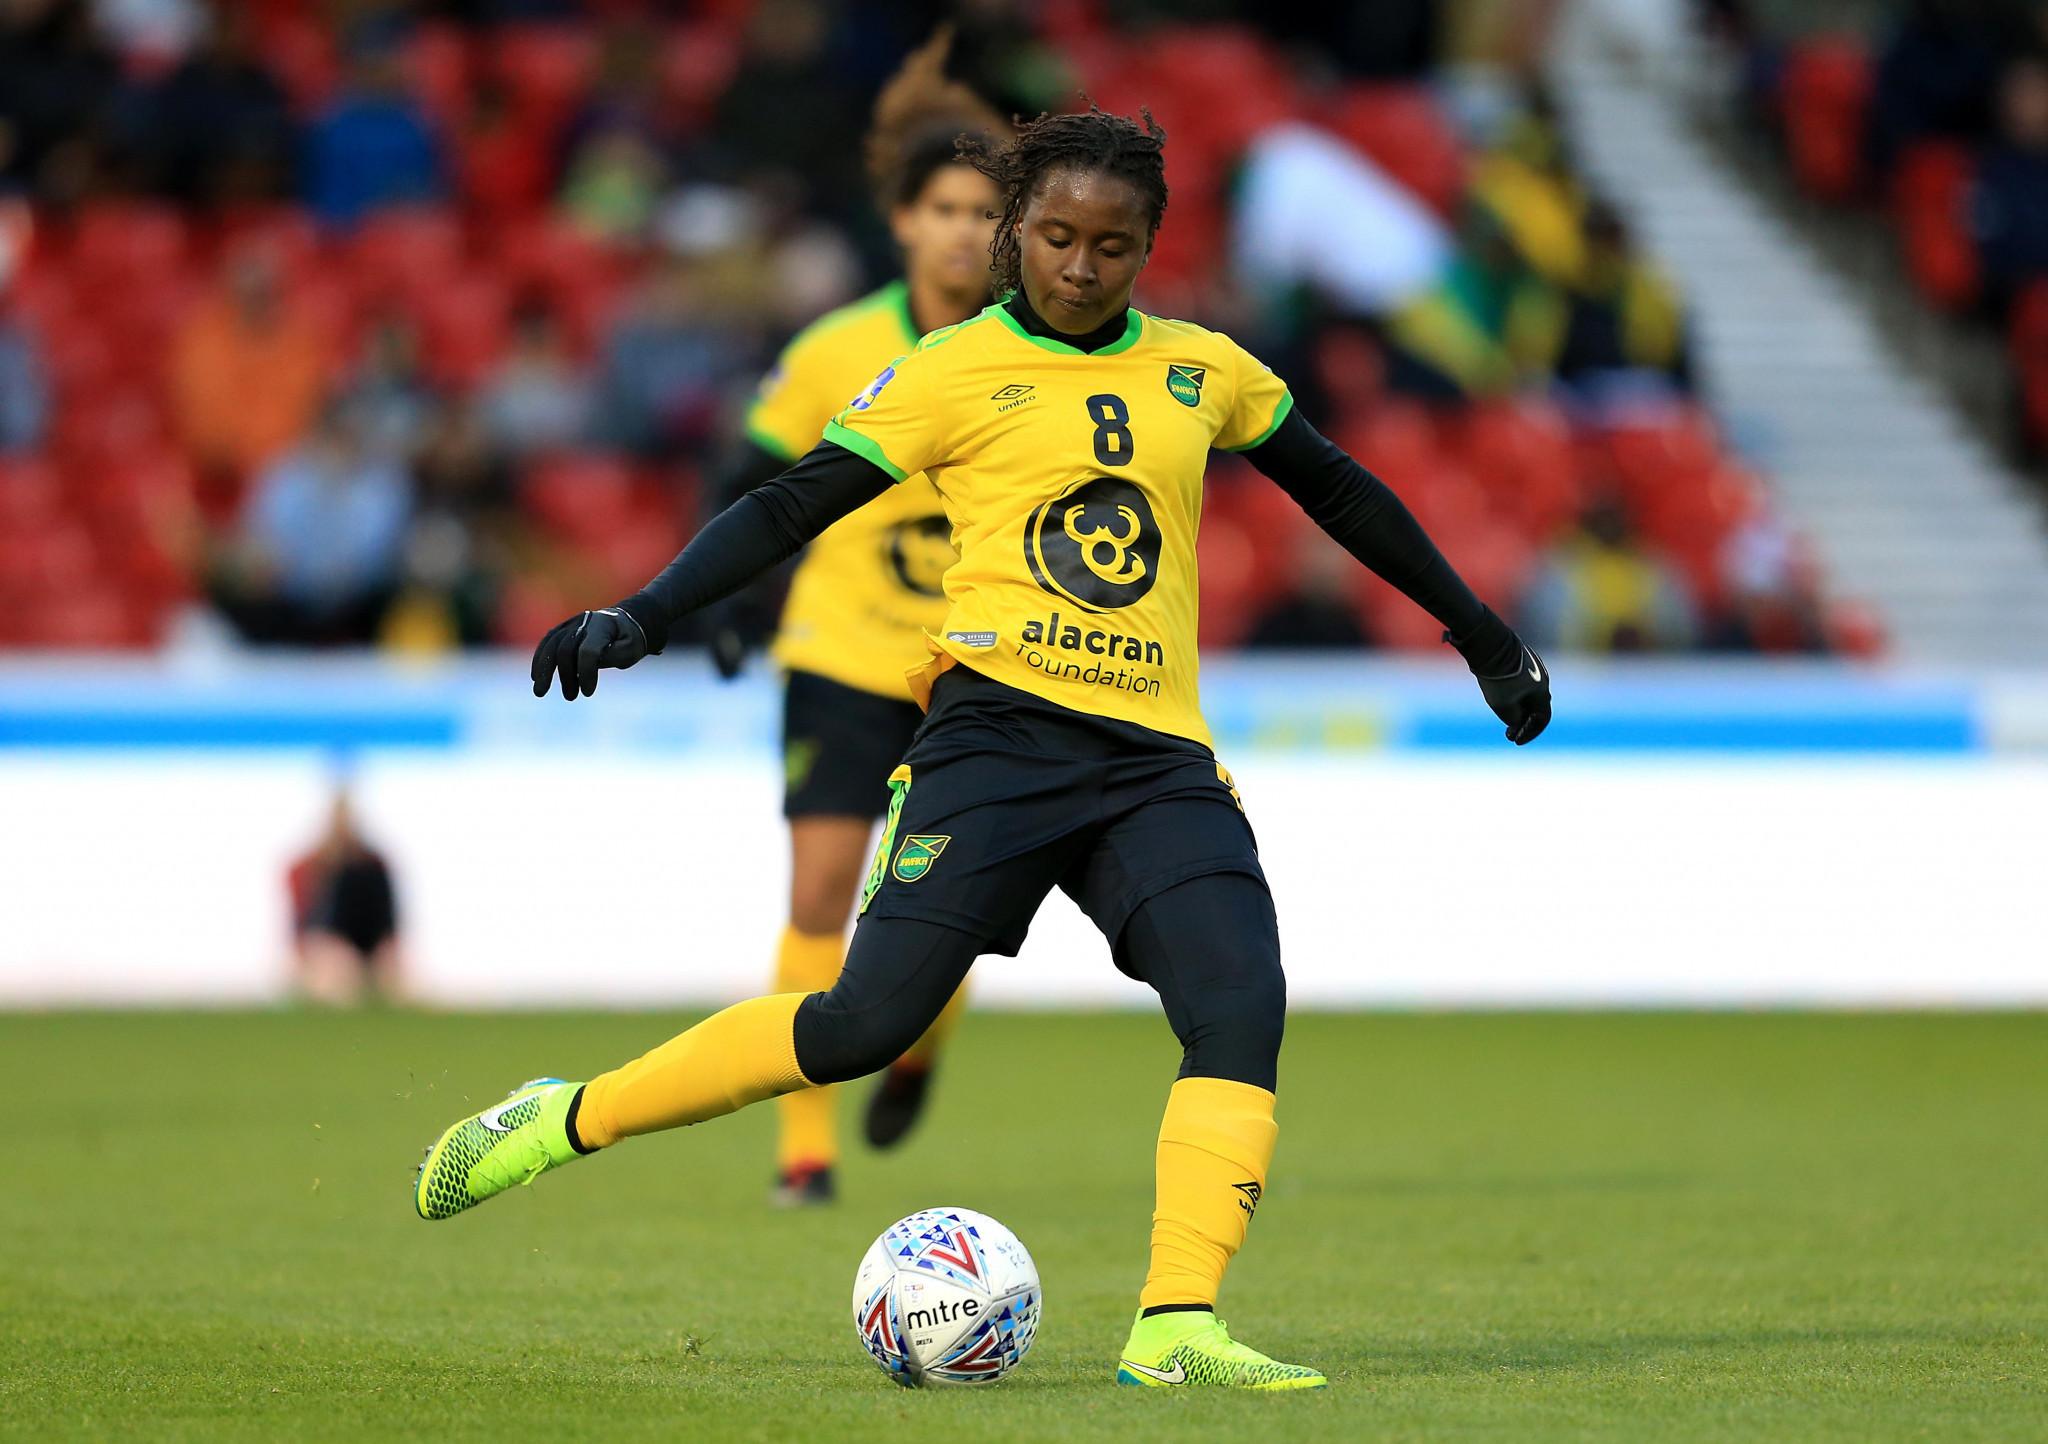 Jamaican footballer Tarania Clarke stabbed to death